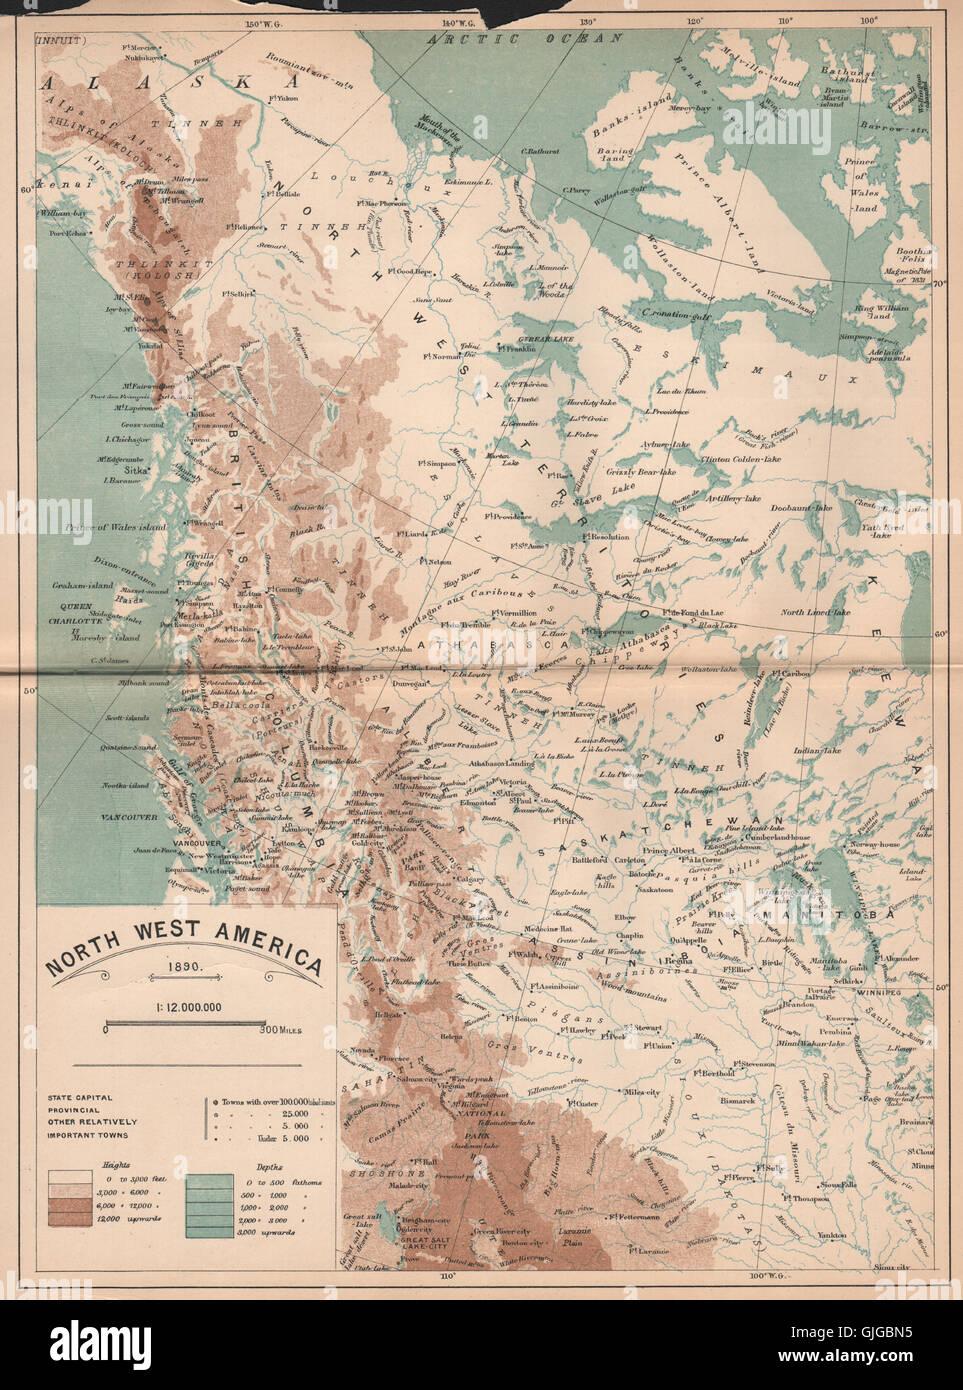 North West Us Plant Hardiness Zone Map Mapsofnet Northwestern - Railway map usa 1890